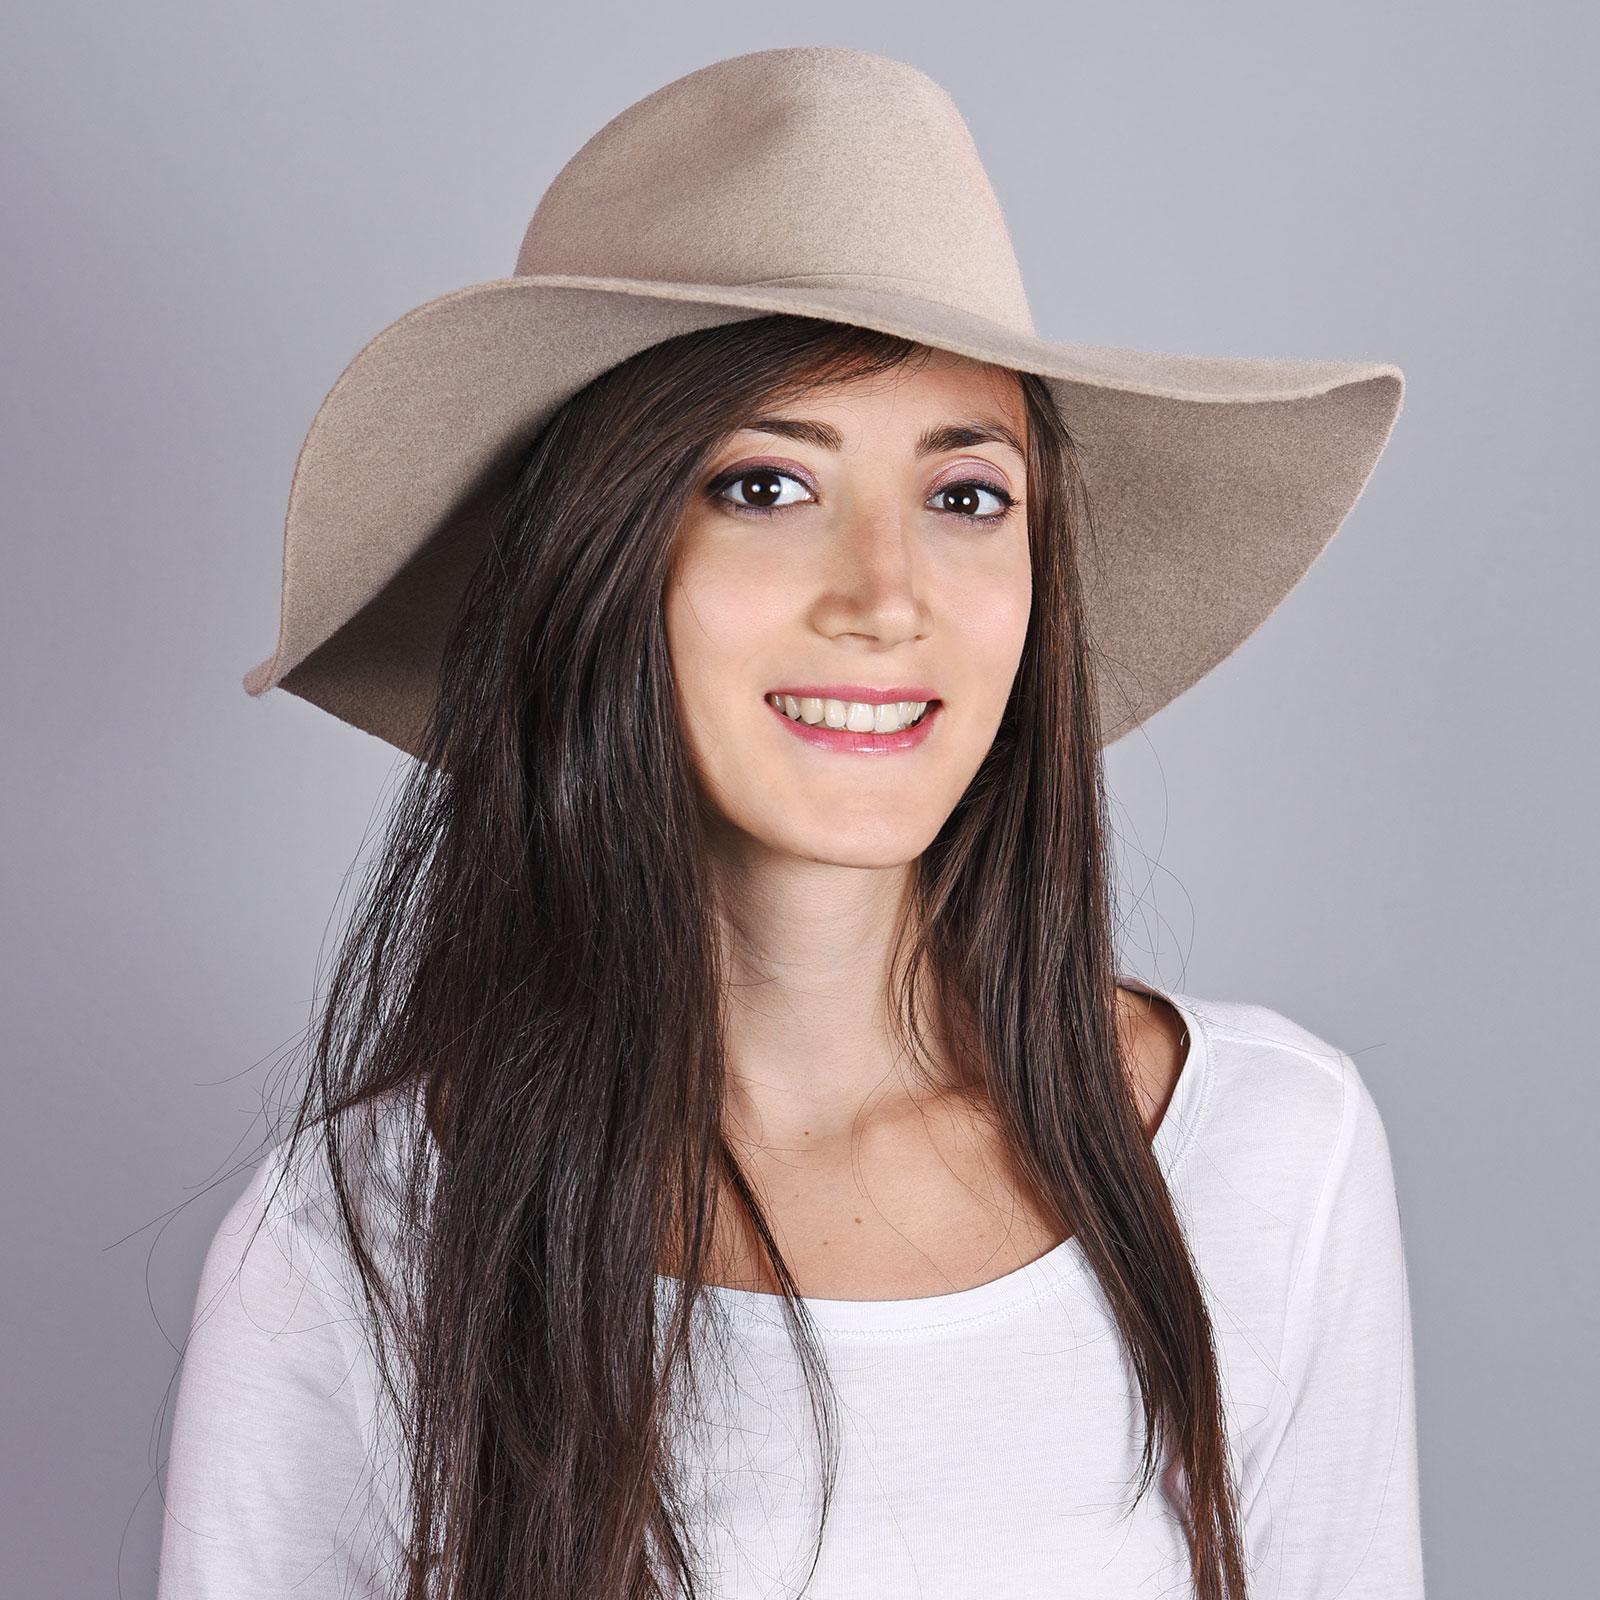 CP-01020-VF16-1-chapeau-femme-hiver-beige